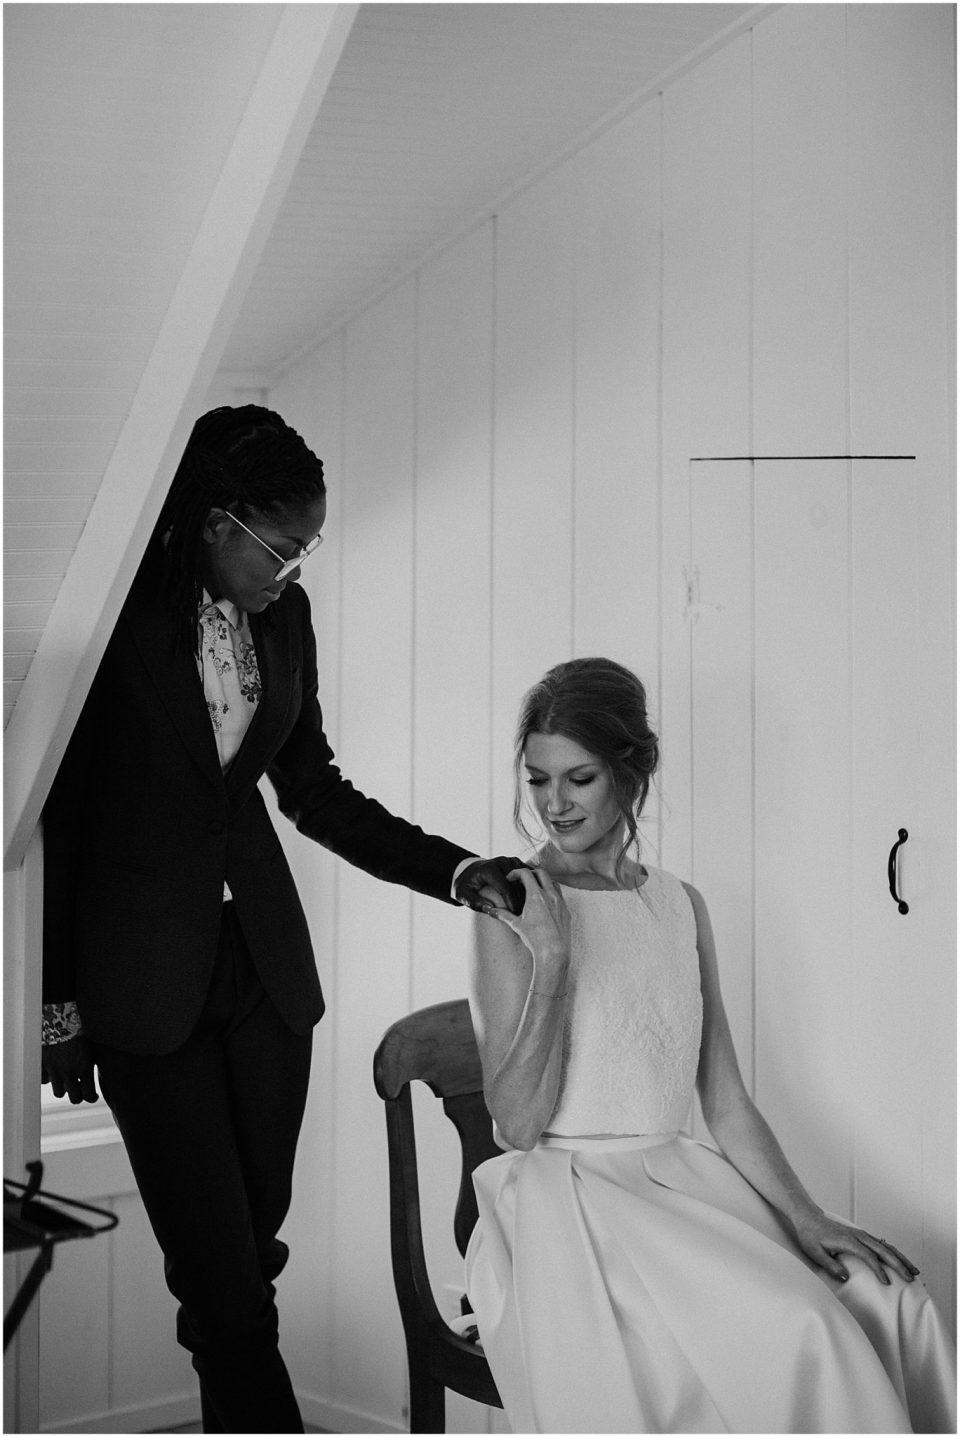 hollis-brittany-sullivan&sullivan-hoodriverwedding (13 of 54)_seattle wedding.jpg